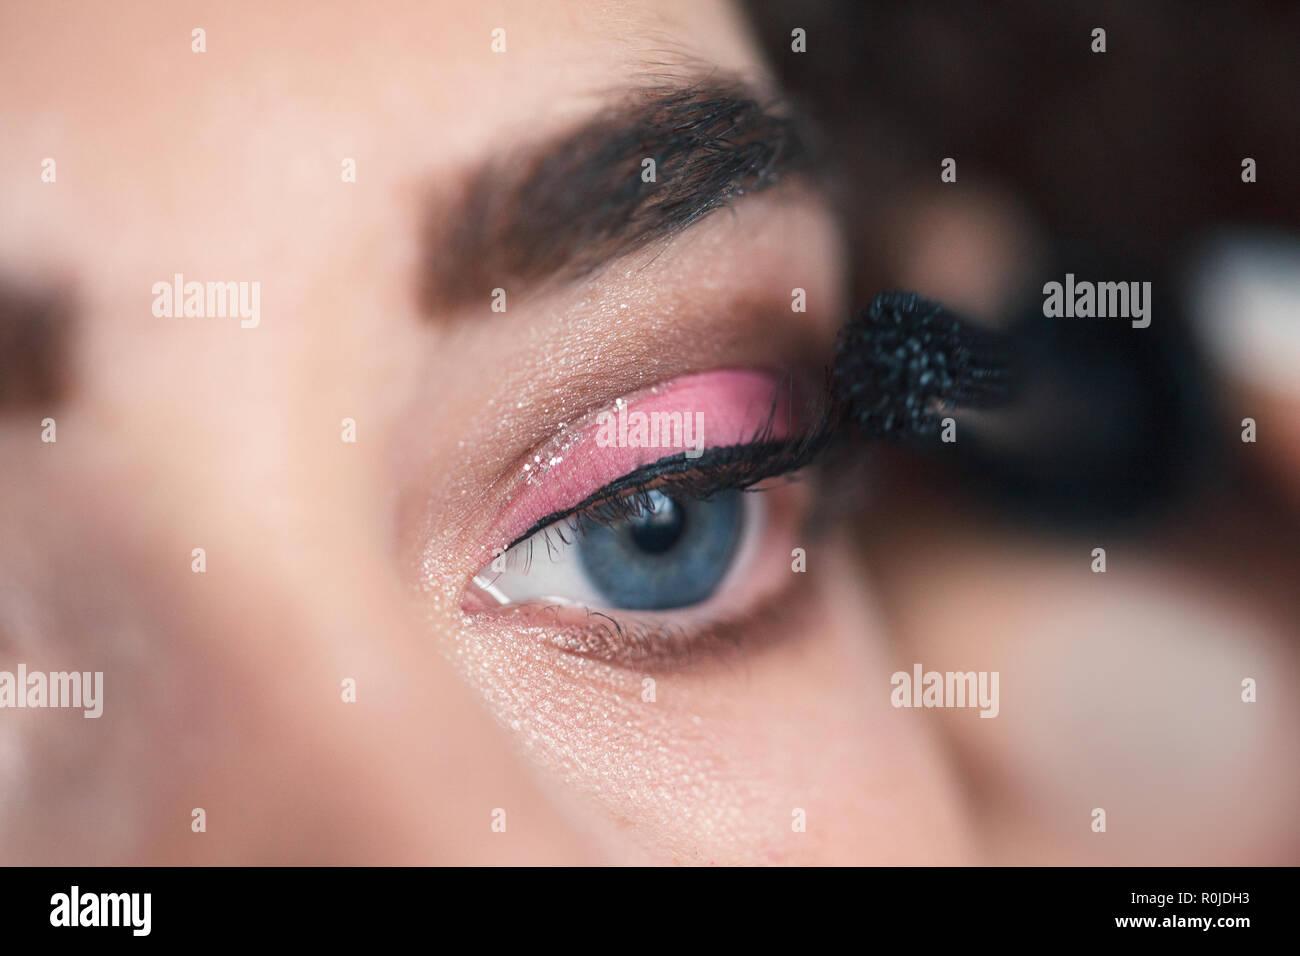 Nahaufnahme Des Make Up Artist Anwenden Smokey Eyes Make Up Beauty